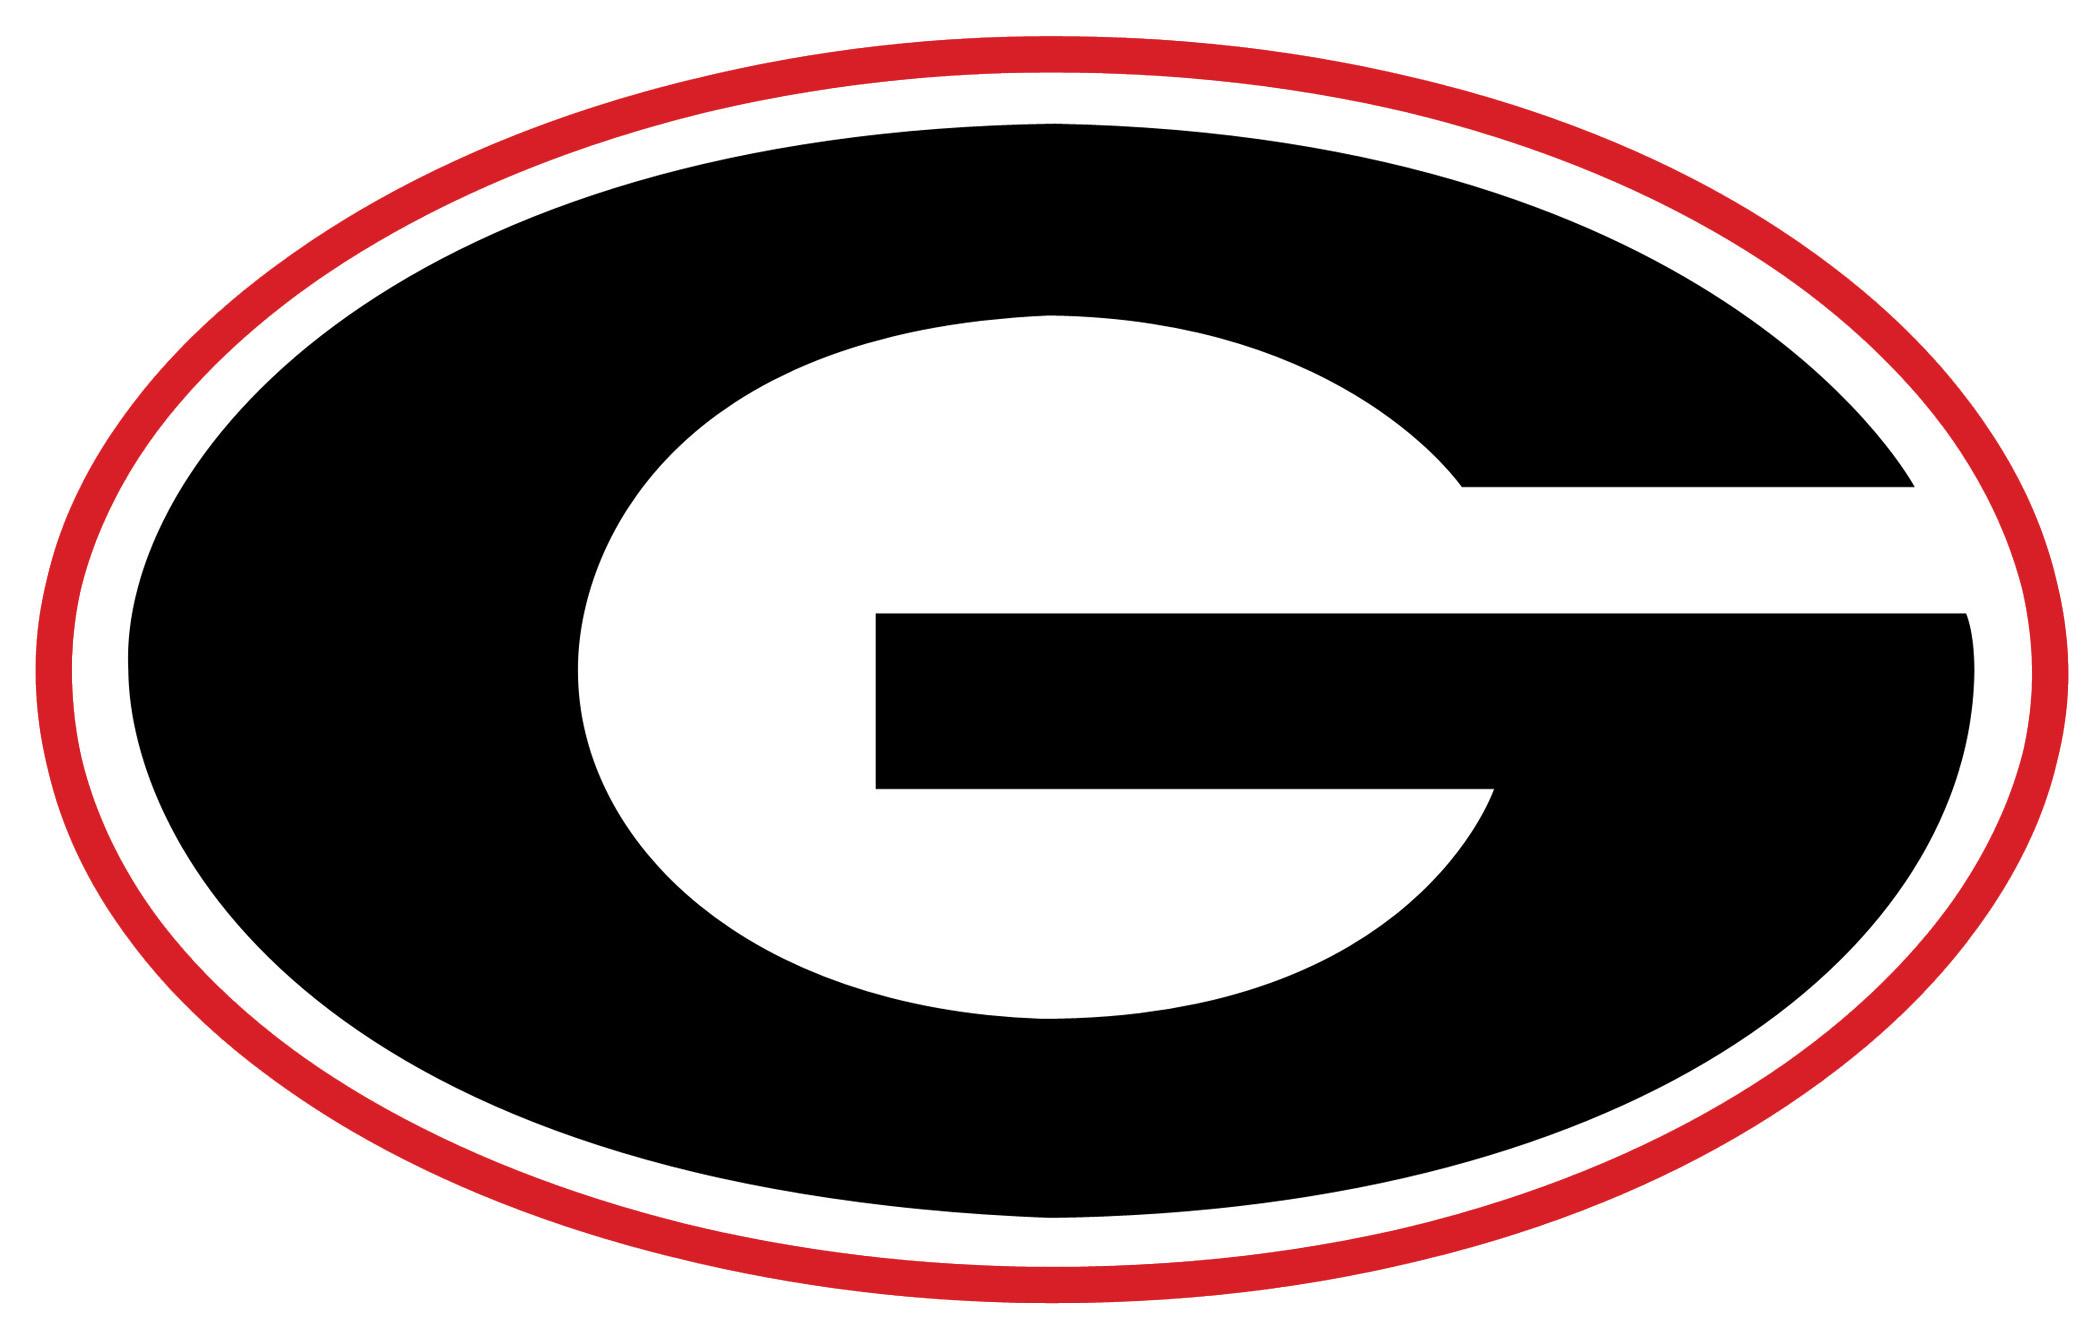 university of georgia logo stencil love this uga university of 2100x1344